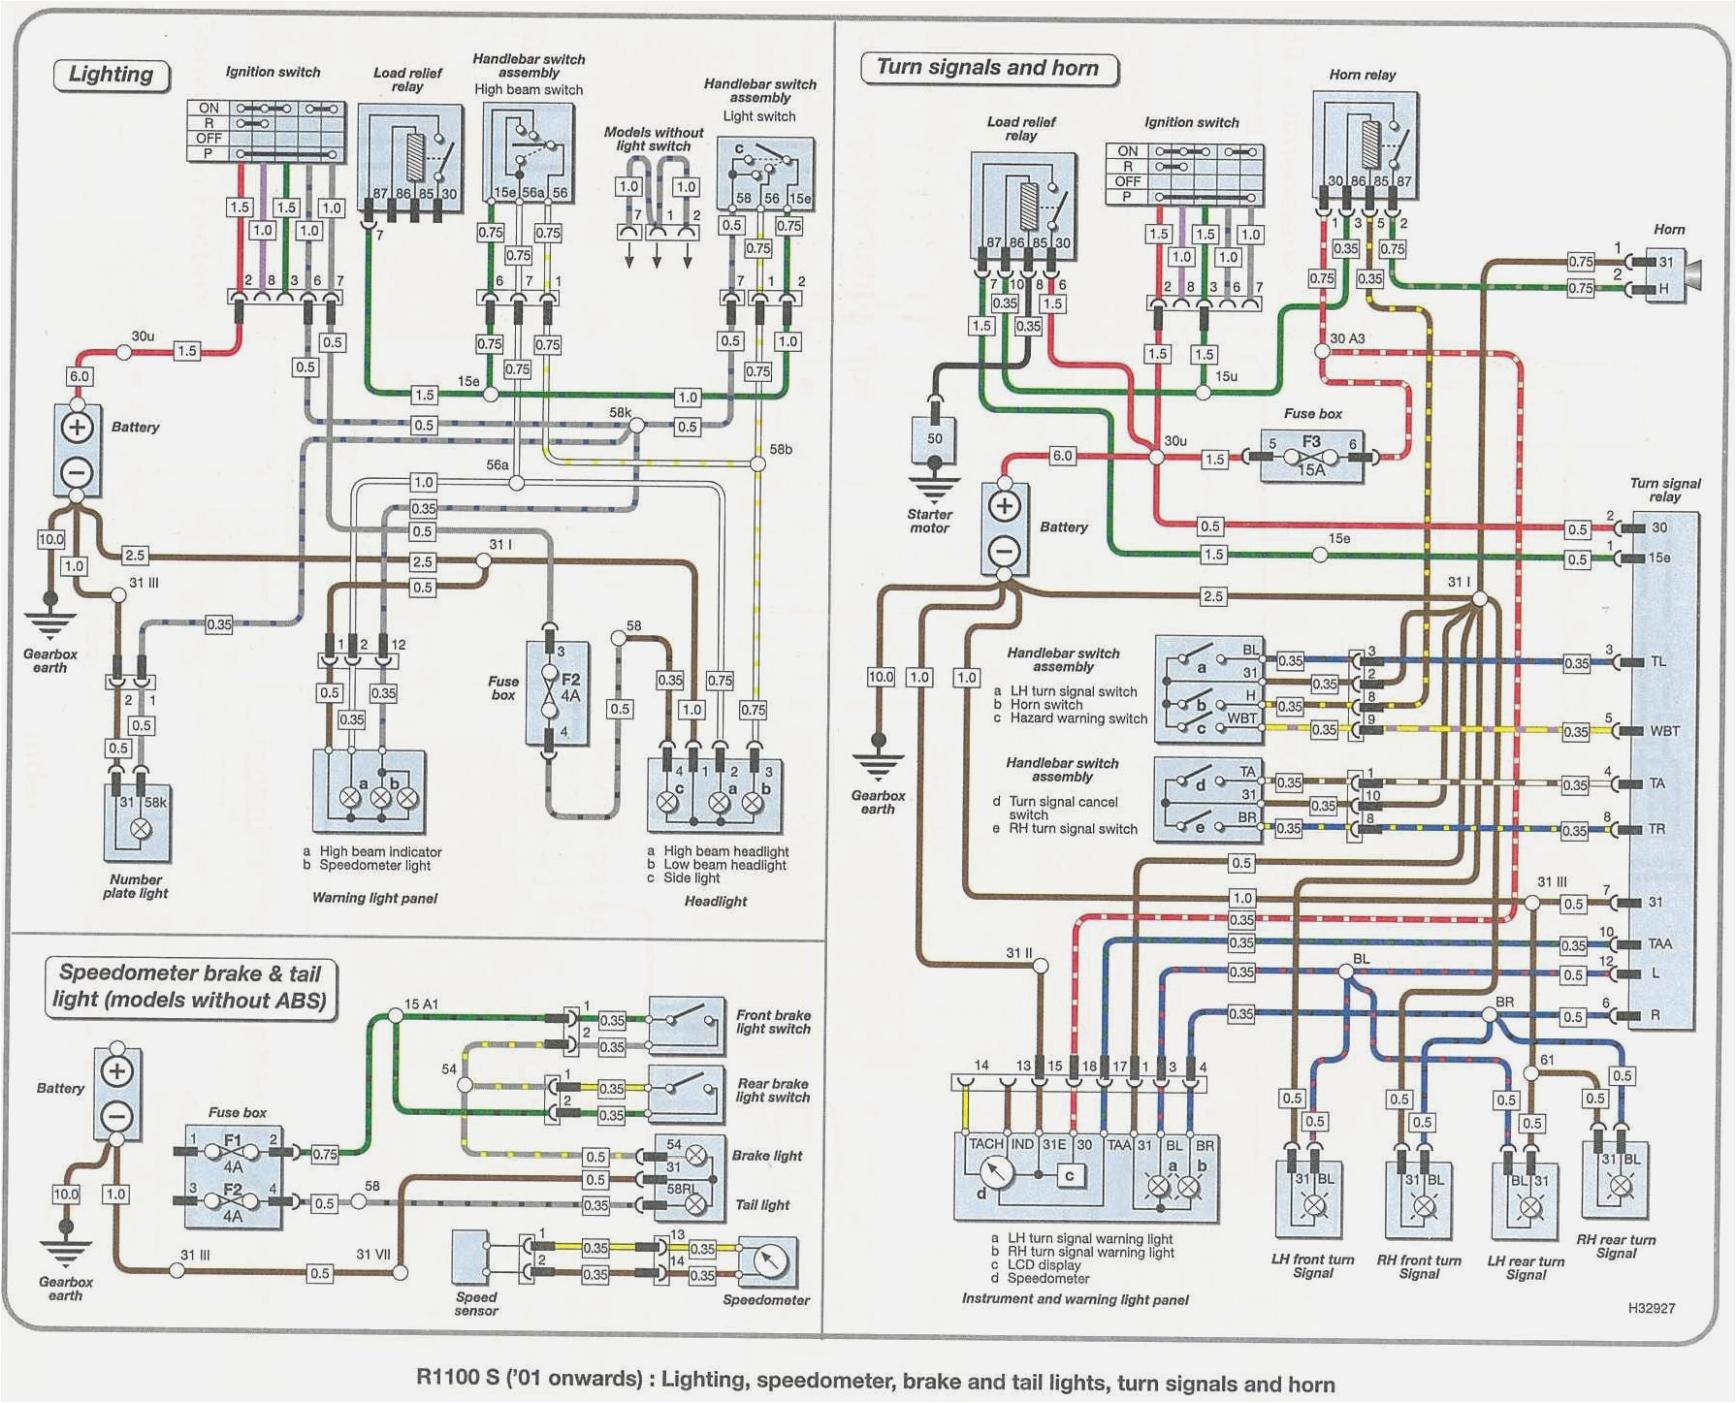 bmw wds wiring diagram blog wiring diagram wds bmw wiring diagram system 5 e60 e61 bmw wiring diagram system